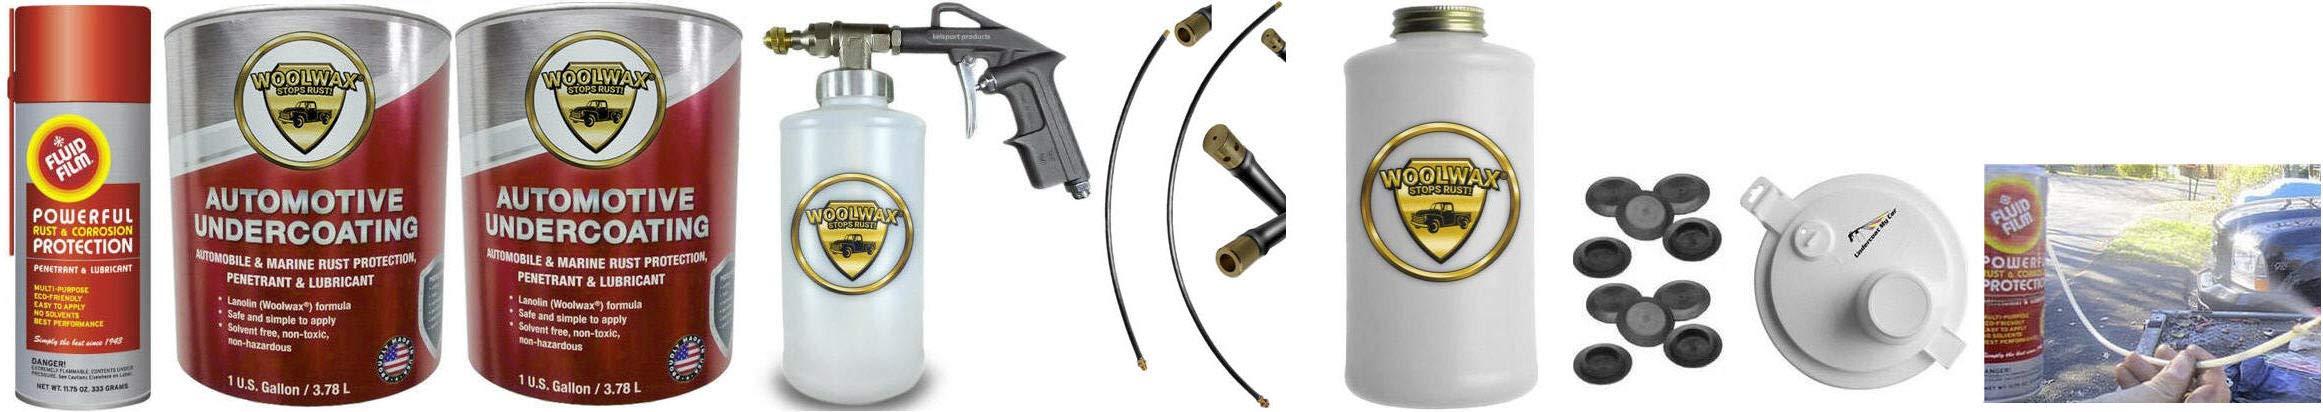 Fluid Film & Woolwax 2 Gallon Undercoating Kit Bundle w/PRO Gun. Black Color.